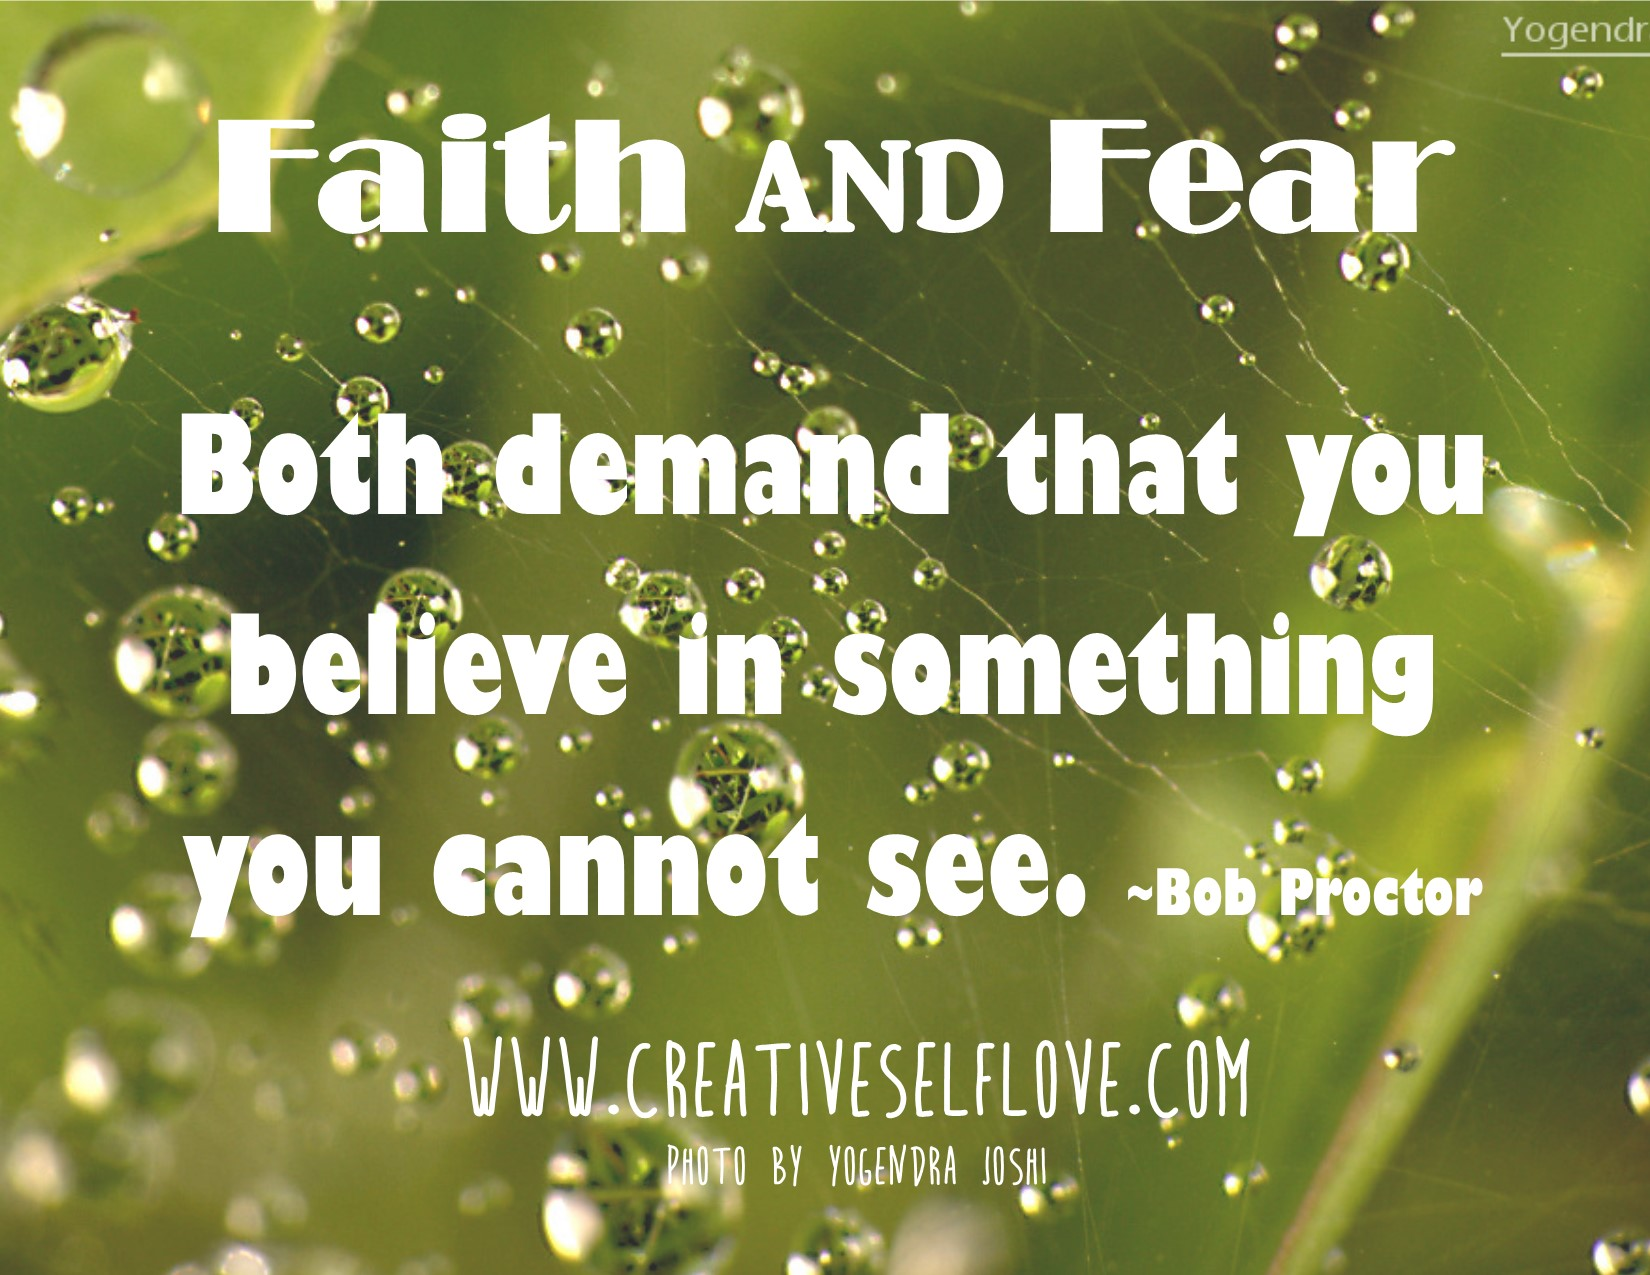 Faith & Fear – Graphics by author; photo: Yogendra Joshi, Flickr